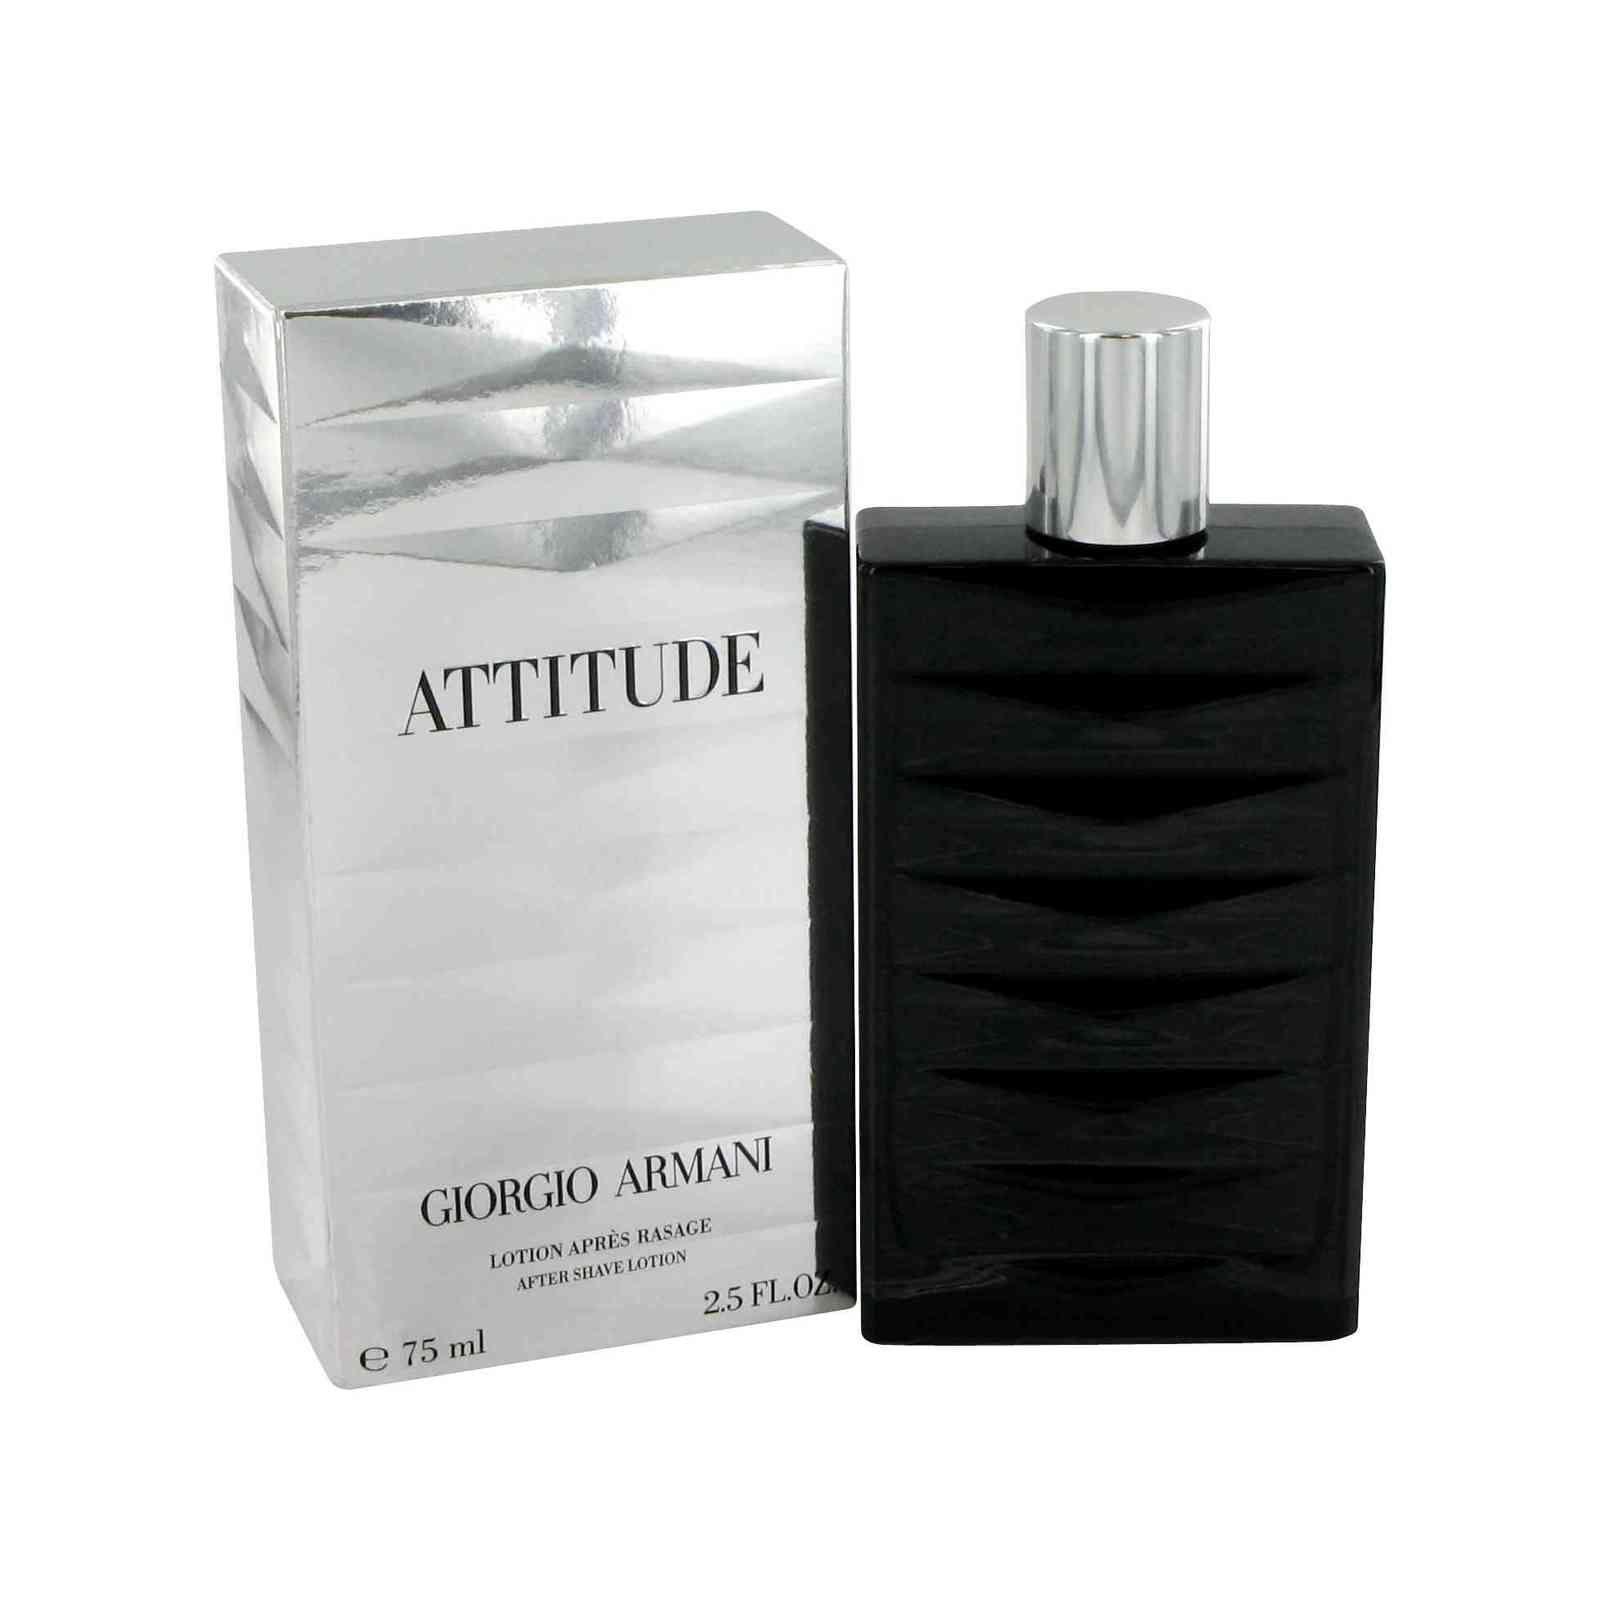 einzigartiges Design Preis vergleichen unglaubliche Preise Giorgio Armani Attitude 2.5oz (75ml) men EDT $69.99 ...